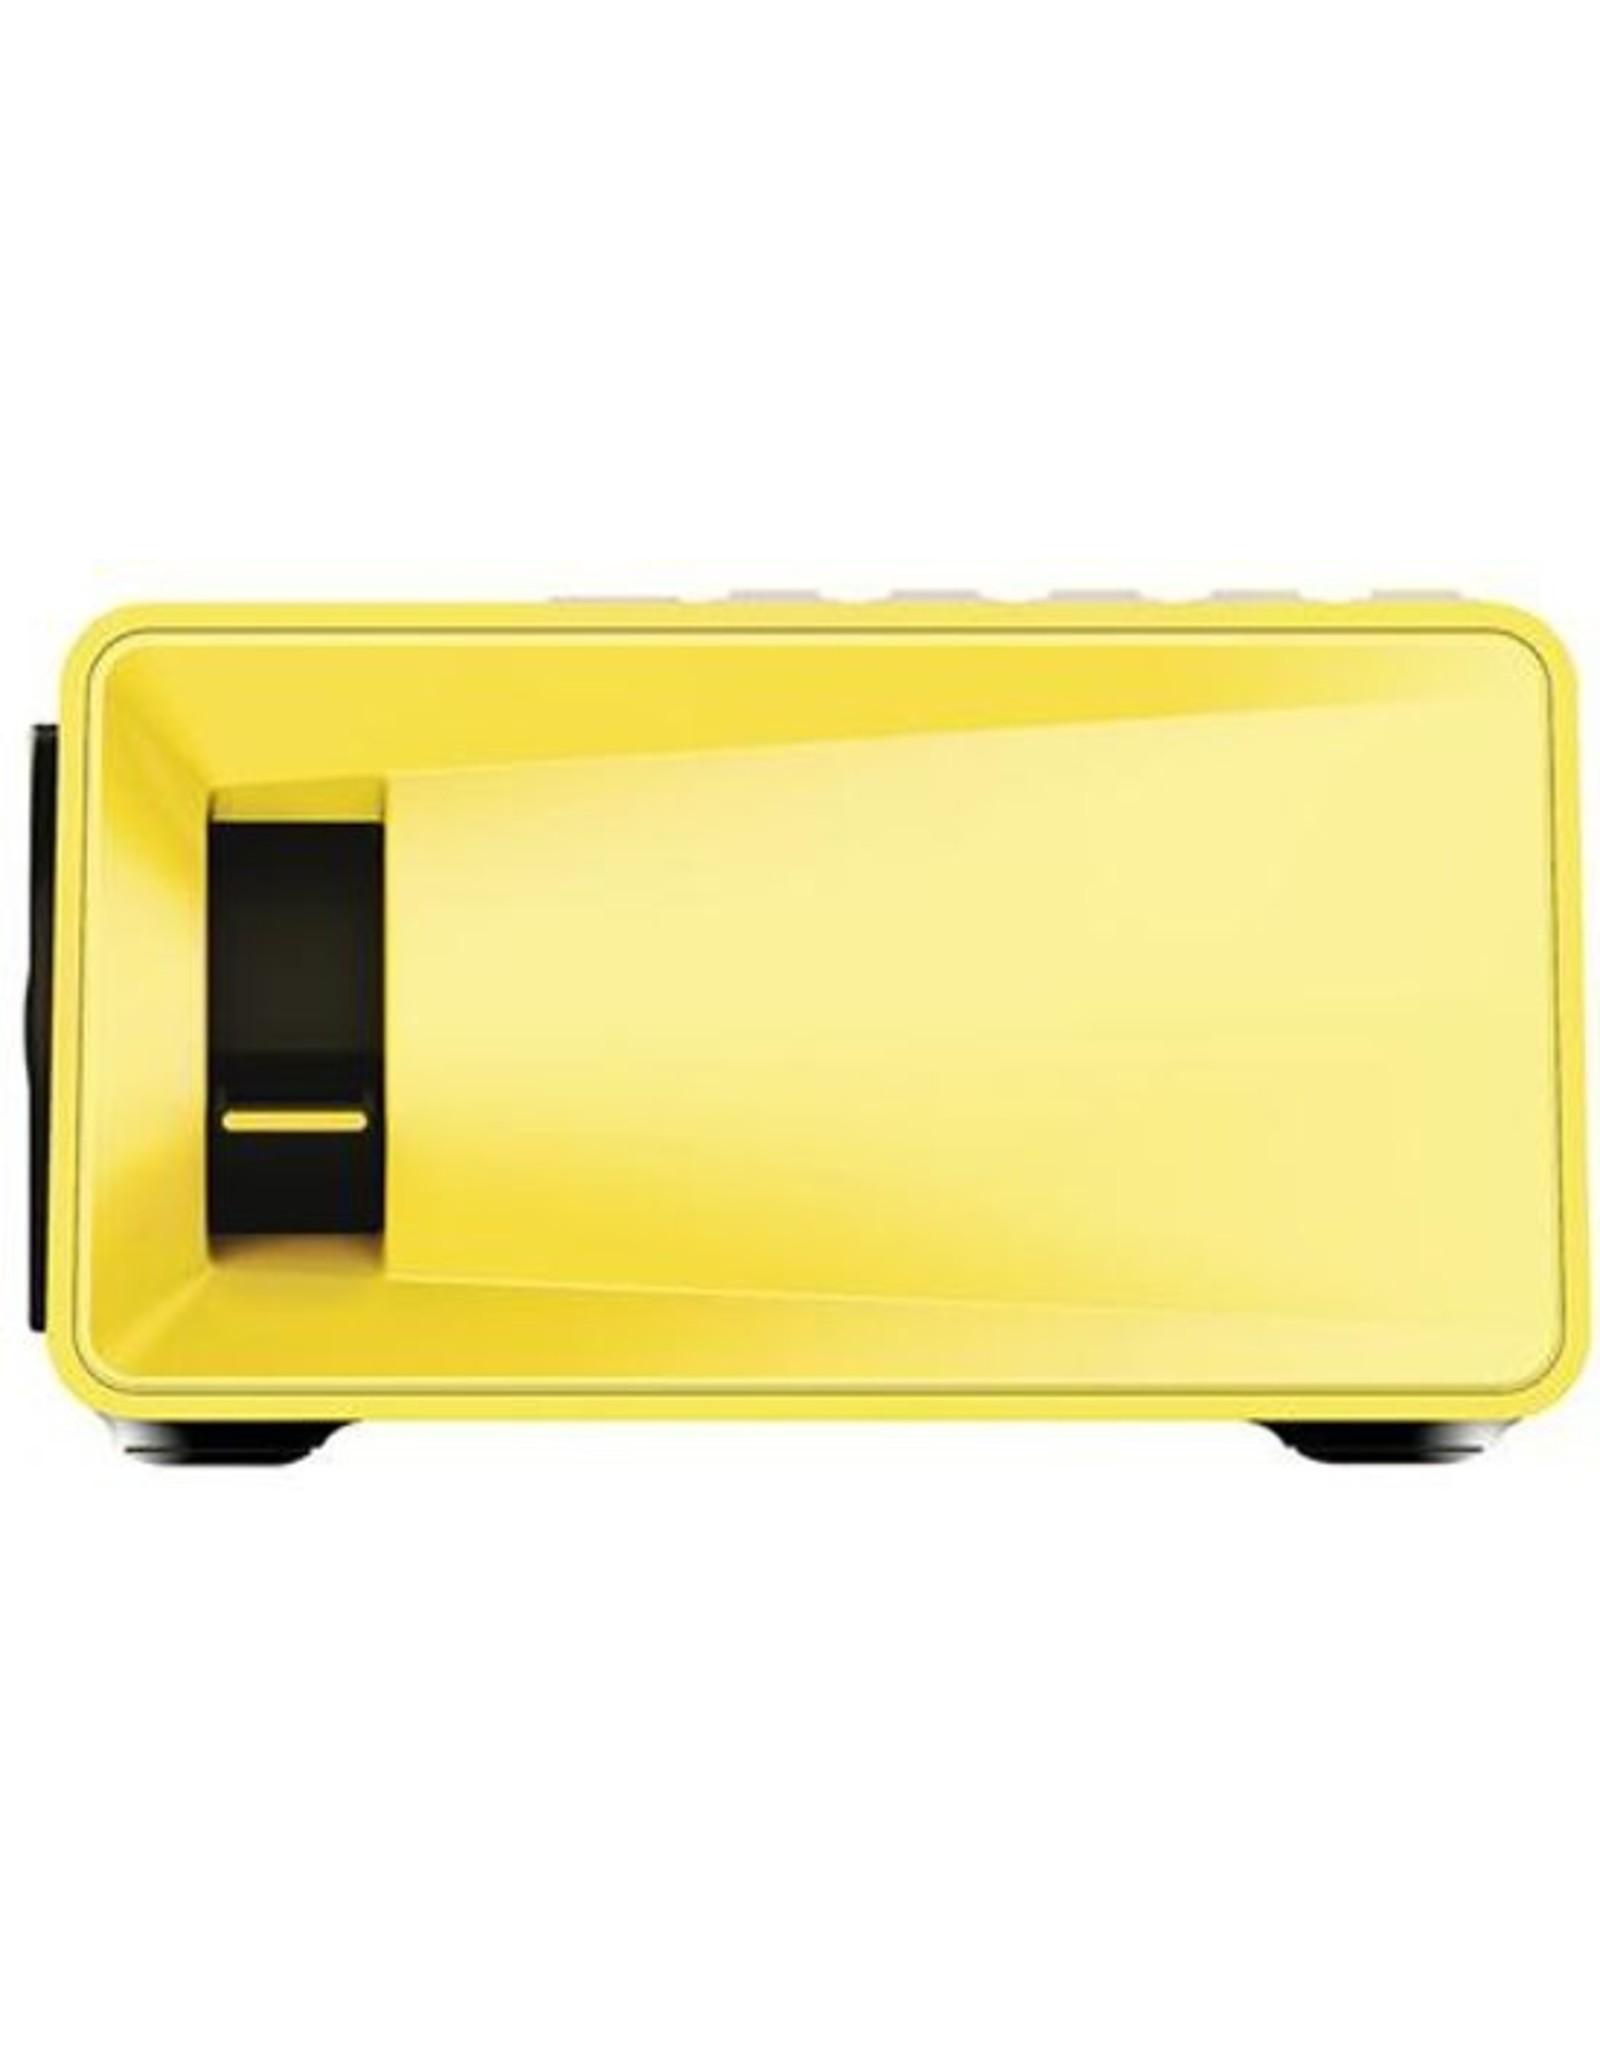 Parya Official  Mini Beamer - Full HD - 1080P